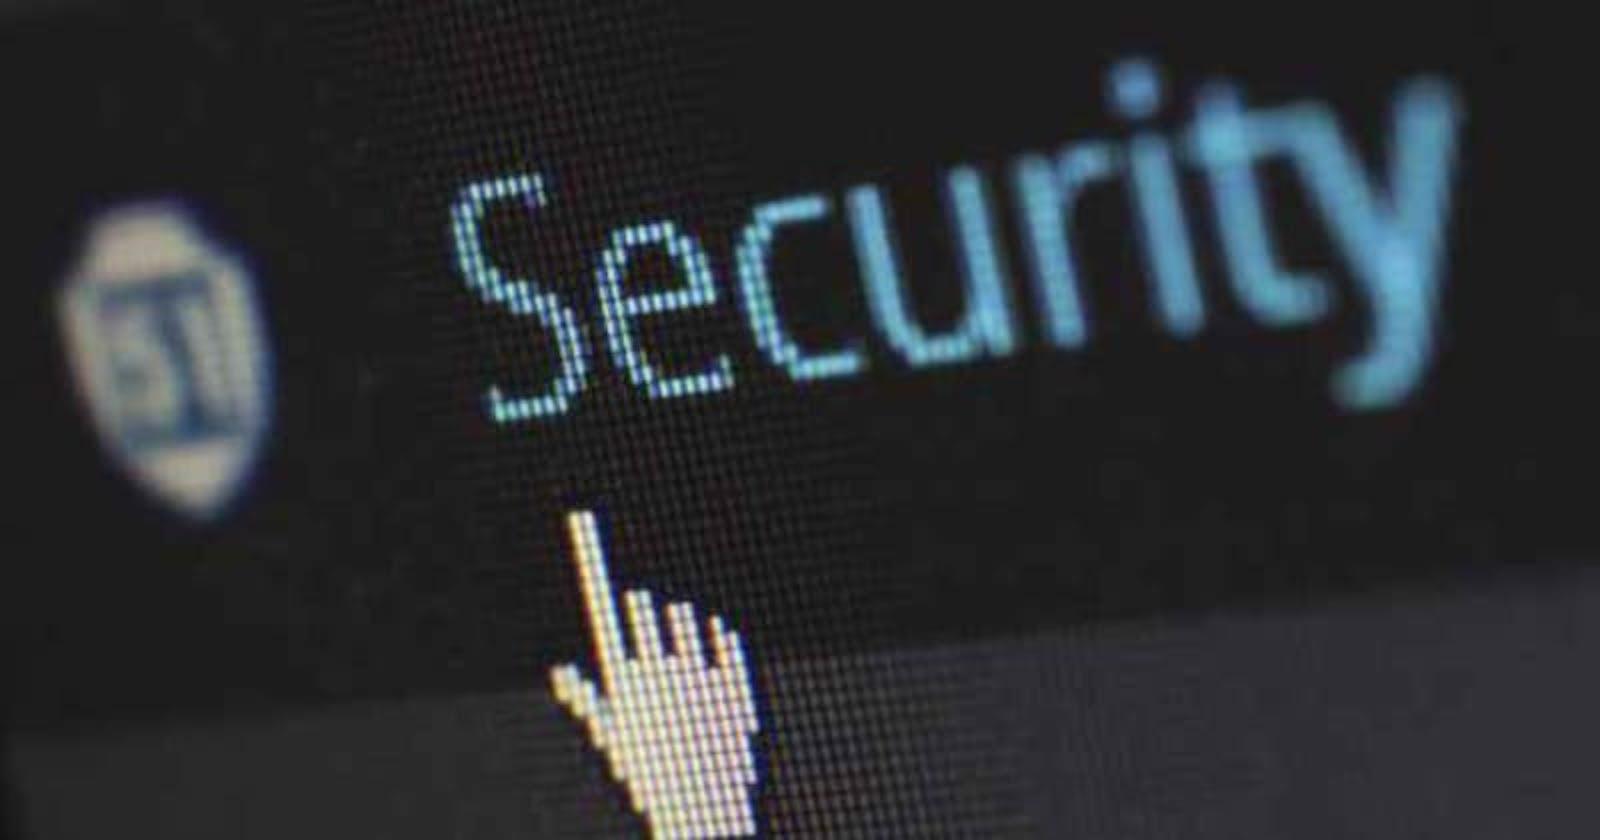 Google drops bombshell zero day exploit affecting Windows 10